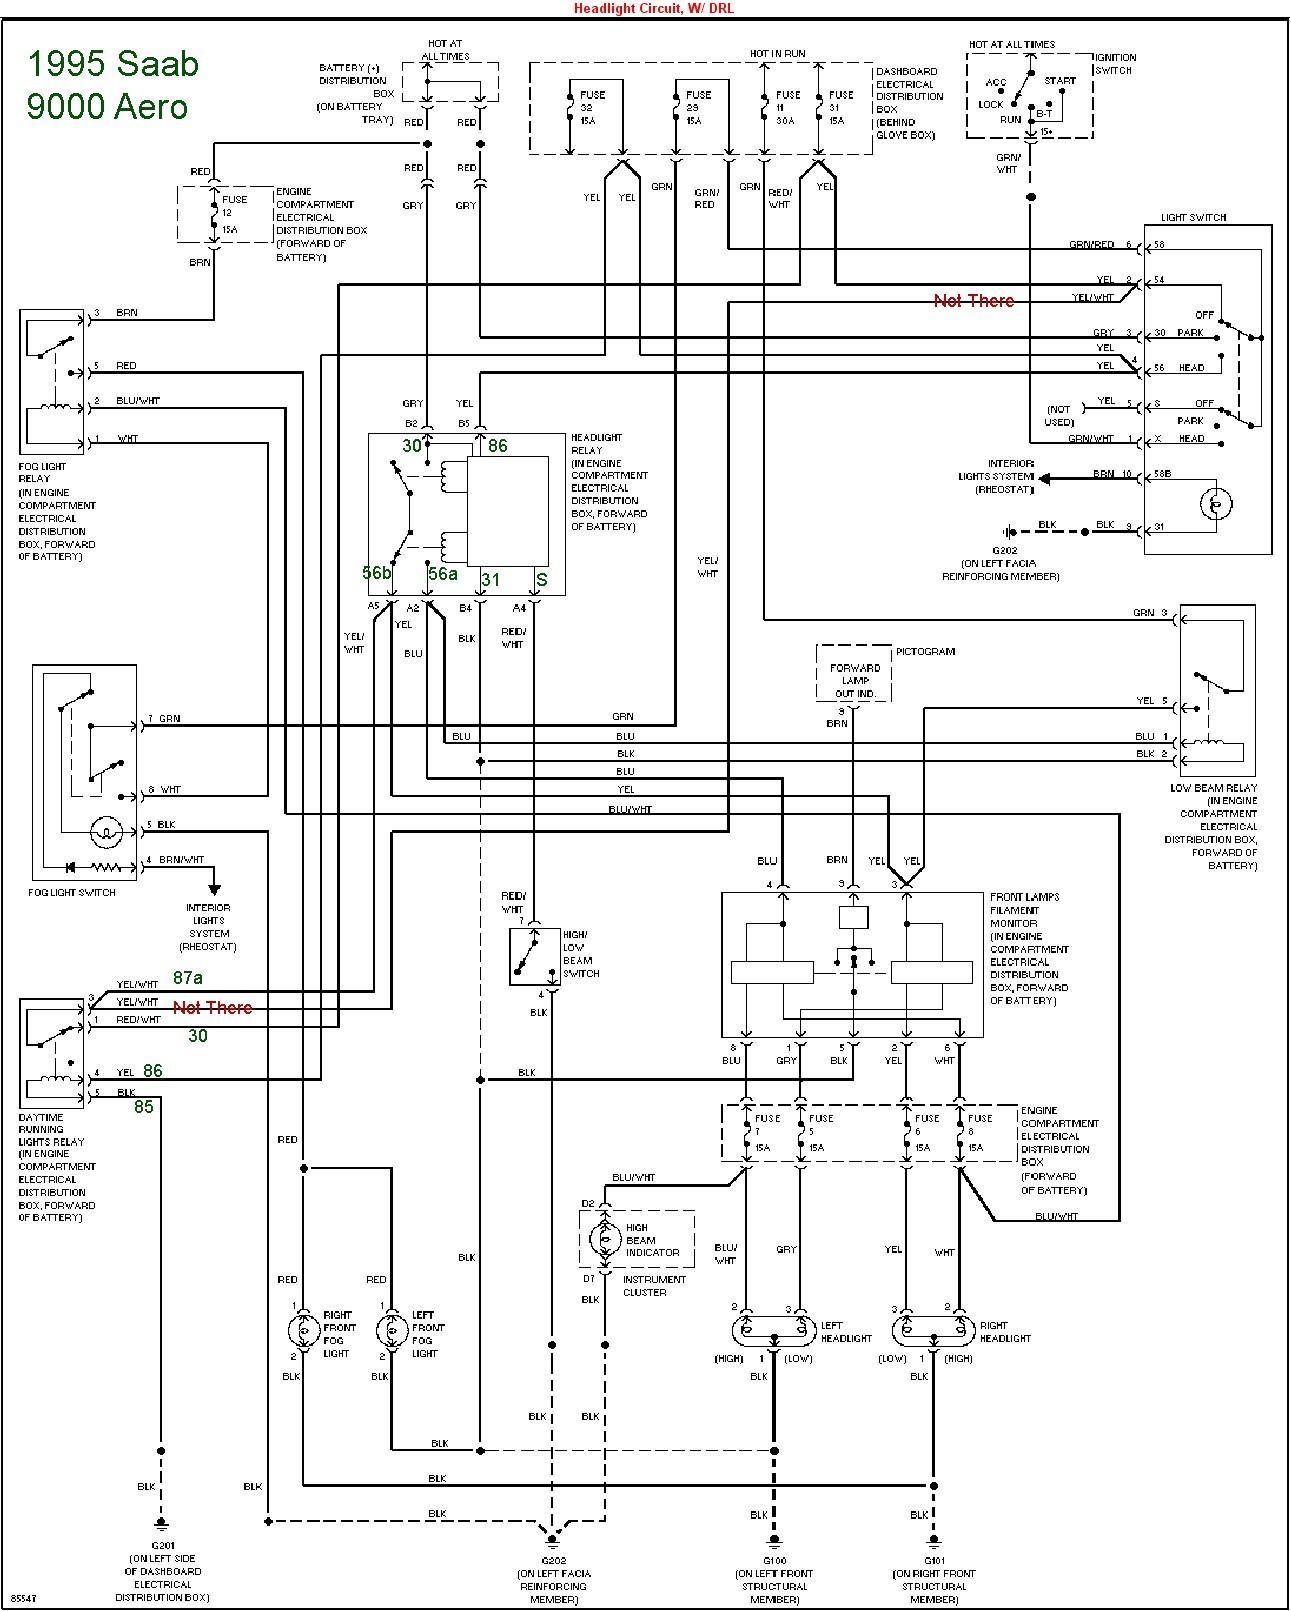 trailer wiring diagram 7 pin new 2002 saab 9 5 engine diagram index rh capecodcottagerental us 2005 Saab 9 5 Fuse Diagram HID Light Wiring Diagram